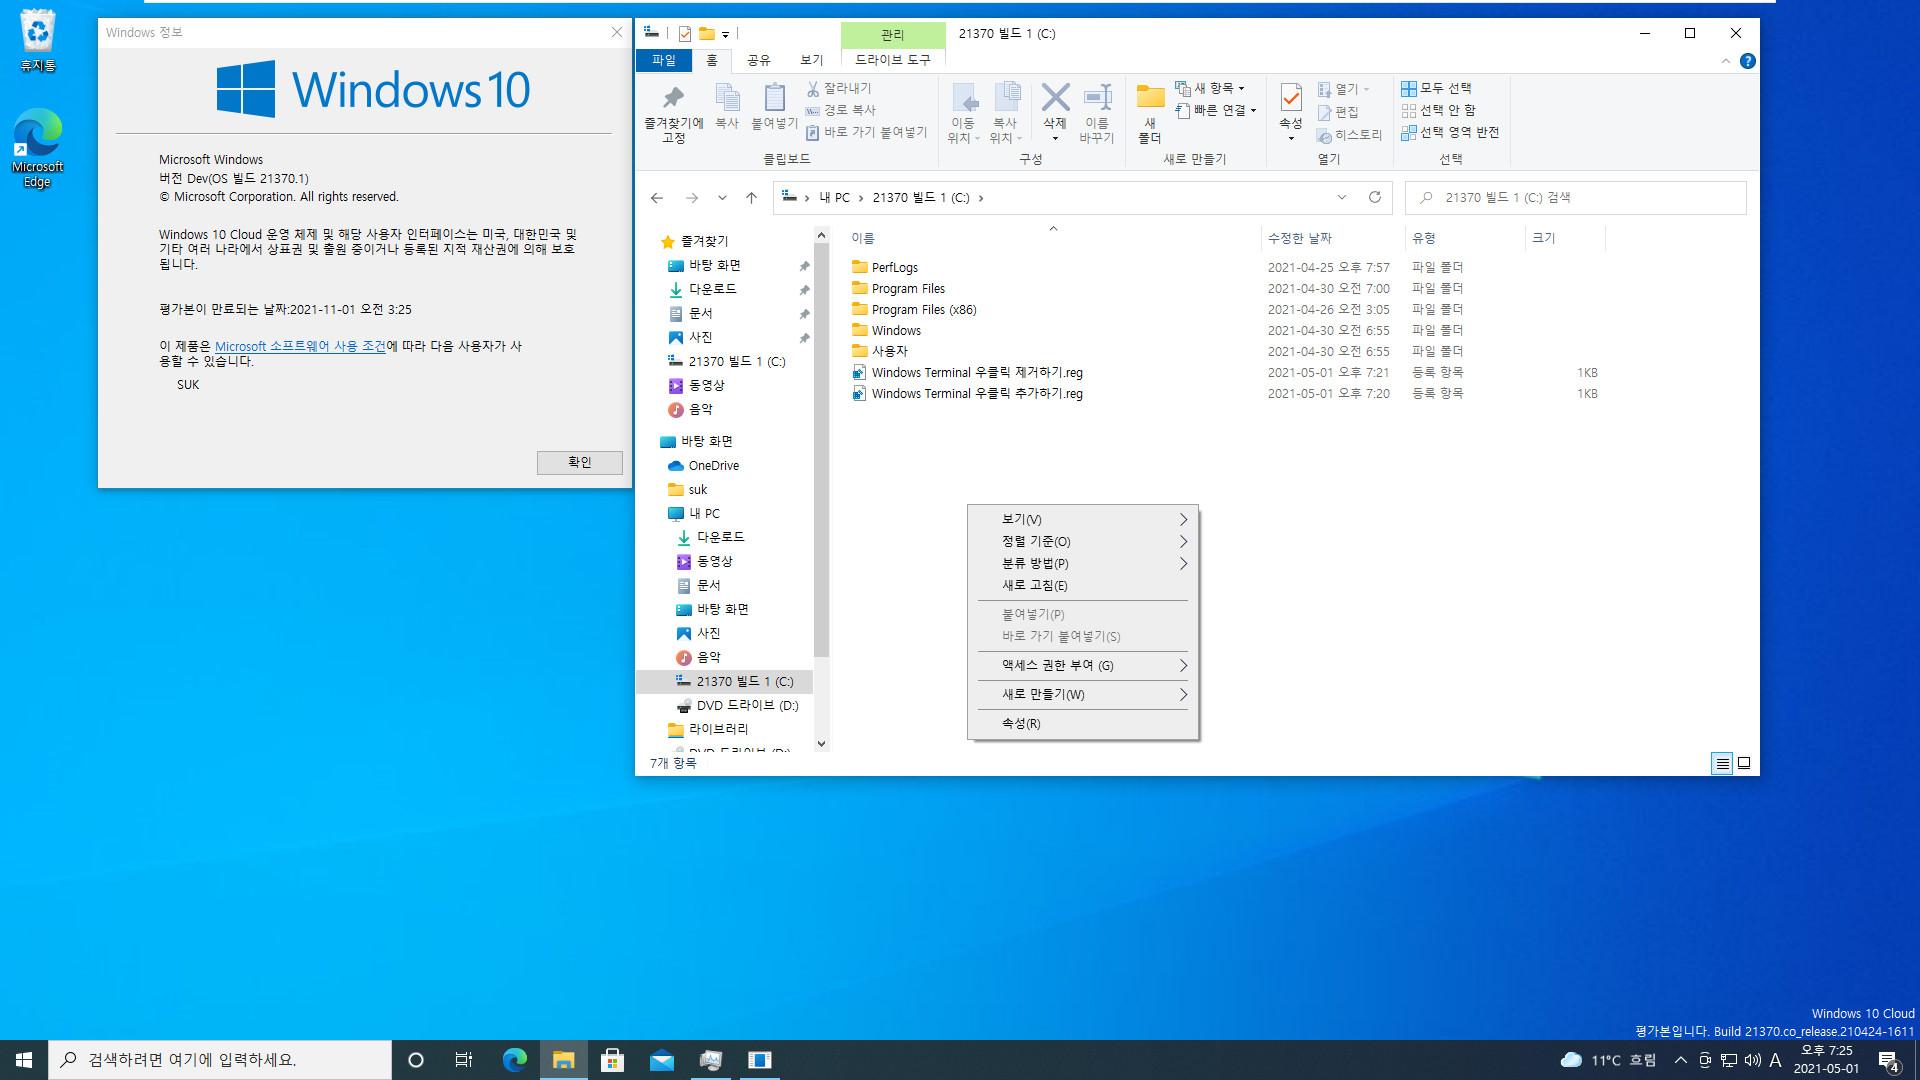 Windows Terminal 우클릭 제거하기.reg와 Windows Terminal 우클릭 추가하기.reg 테스트 2021-05-01_192523.jpg